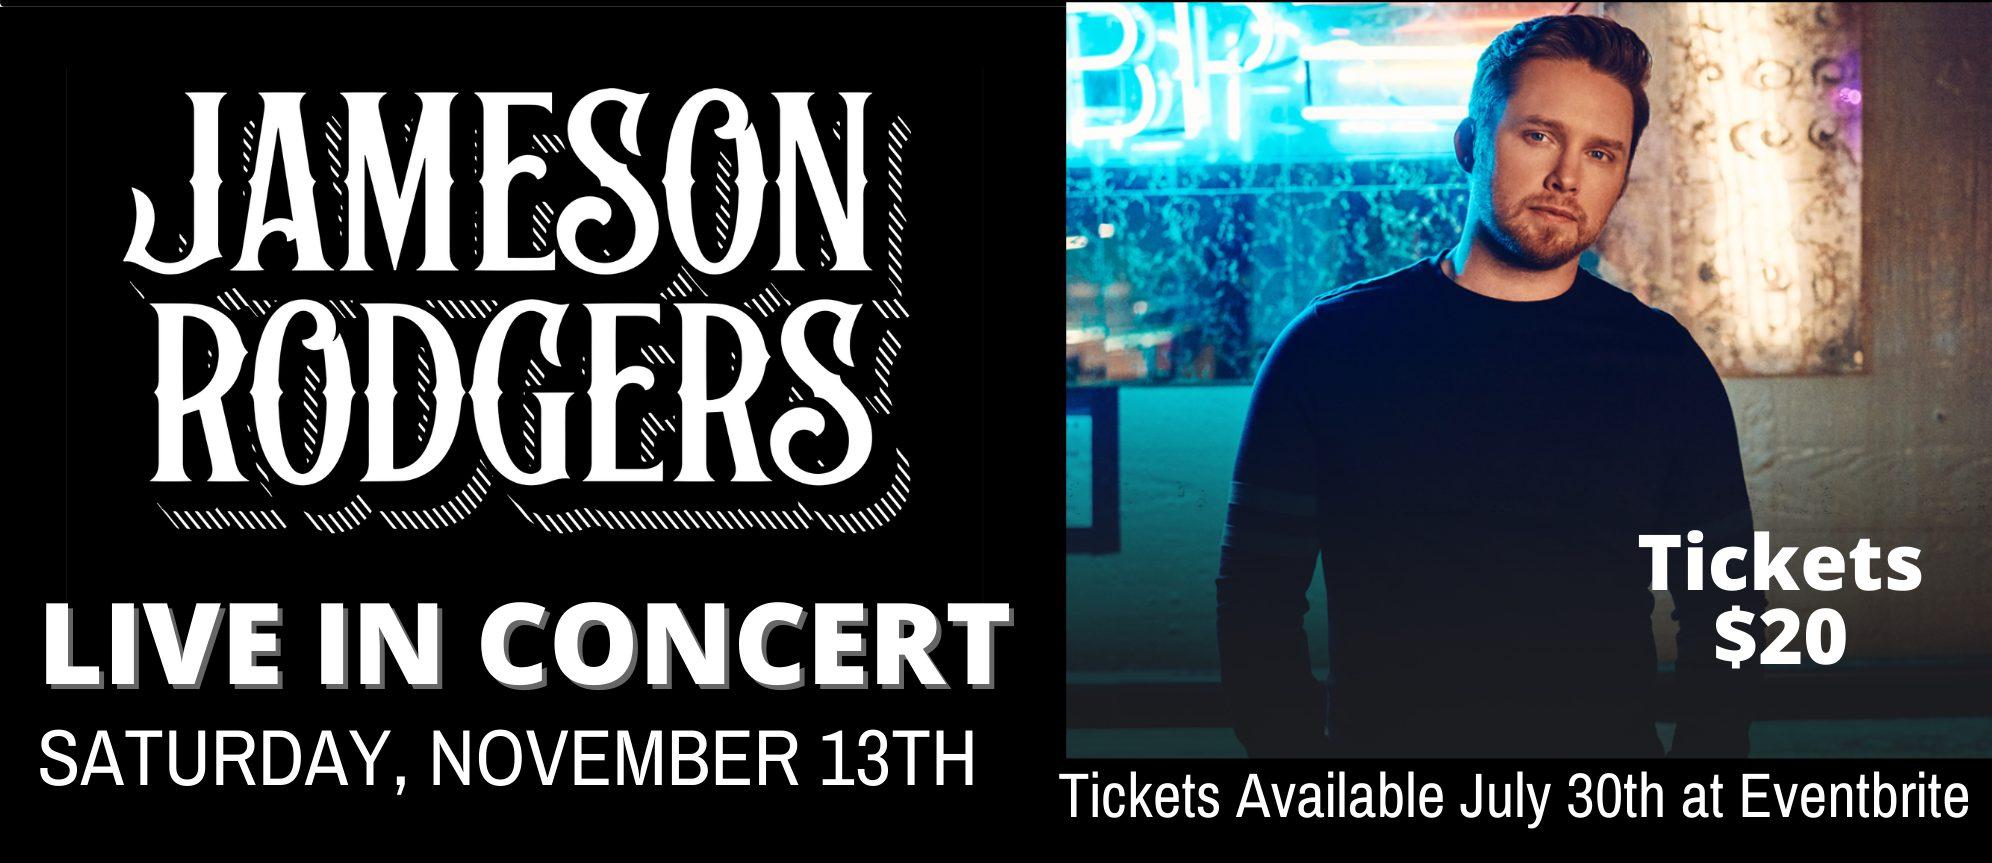 Jameson concert smaller